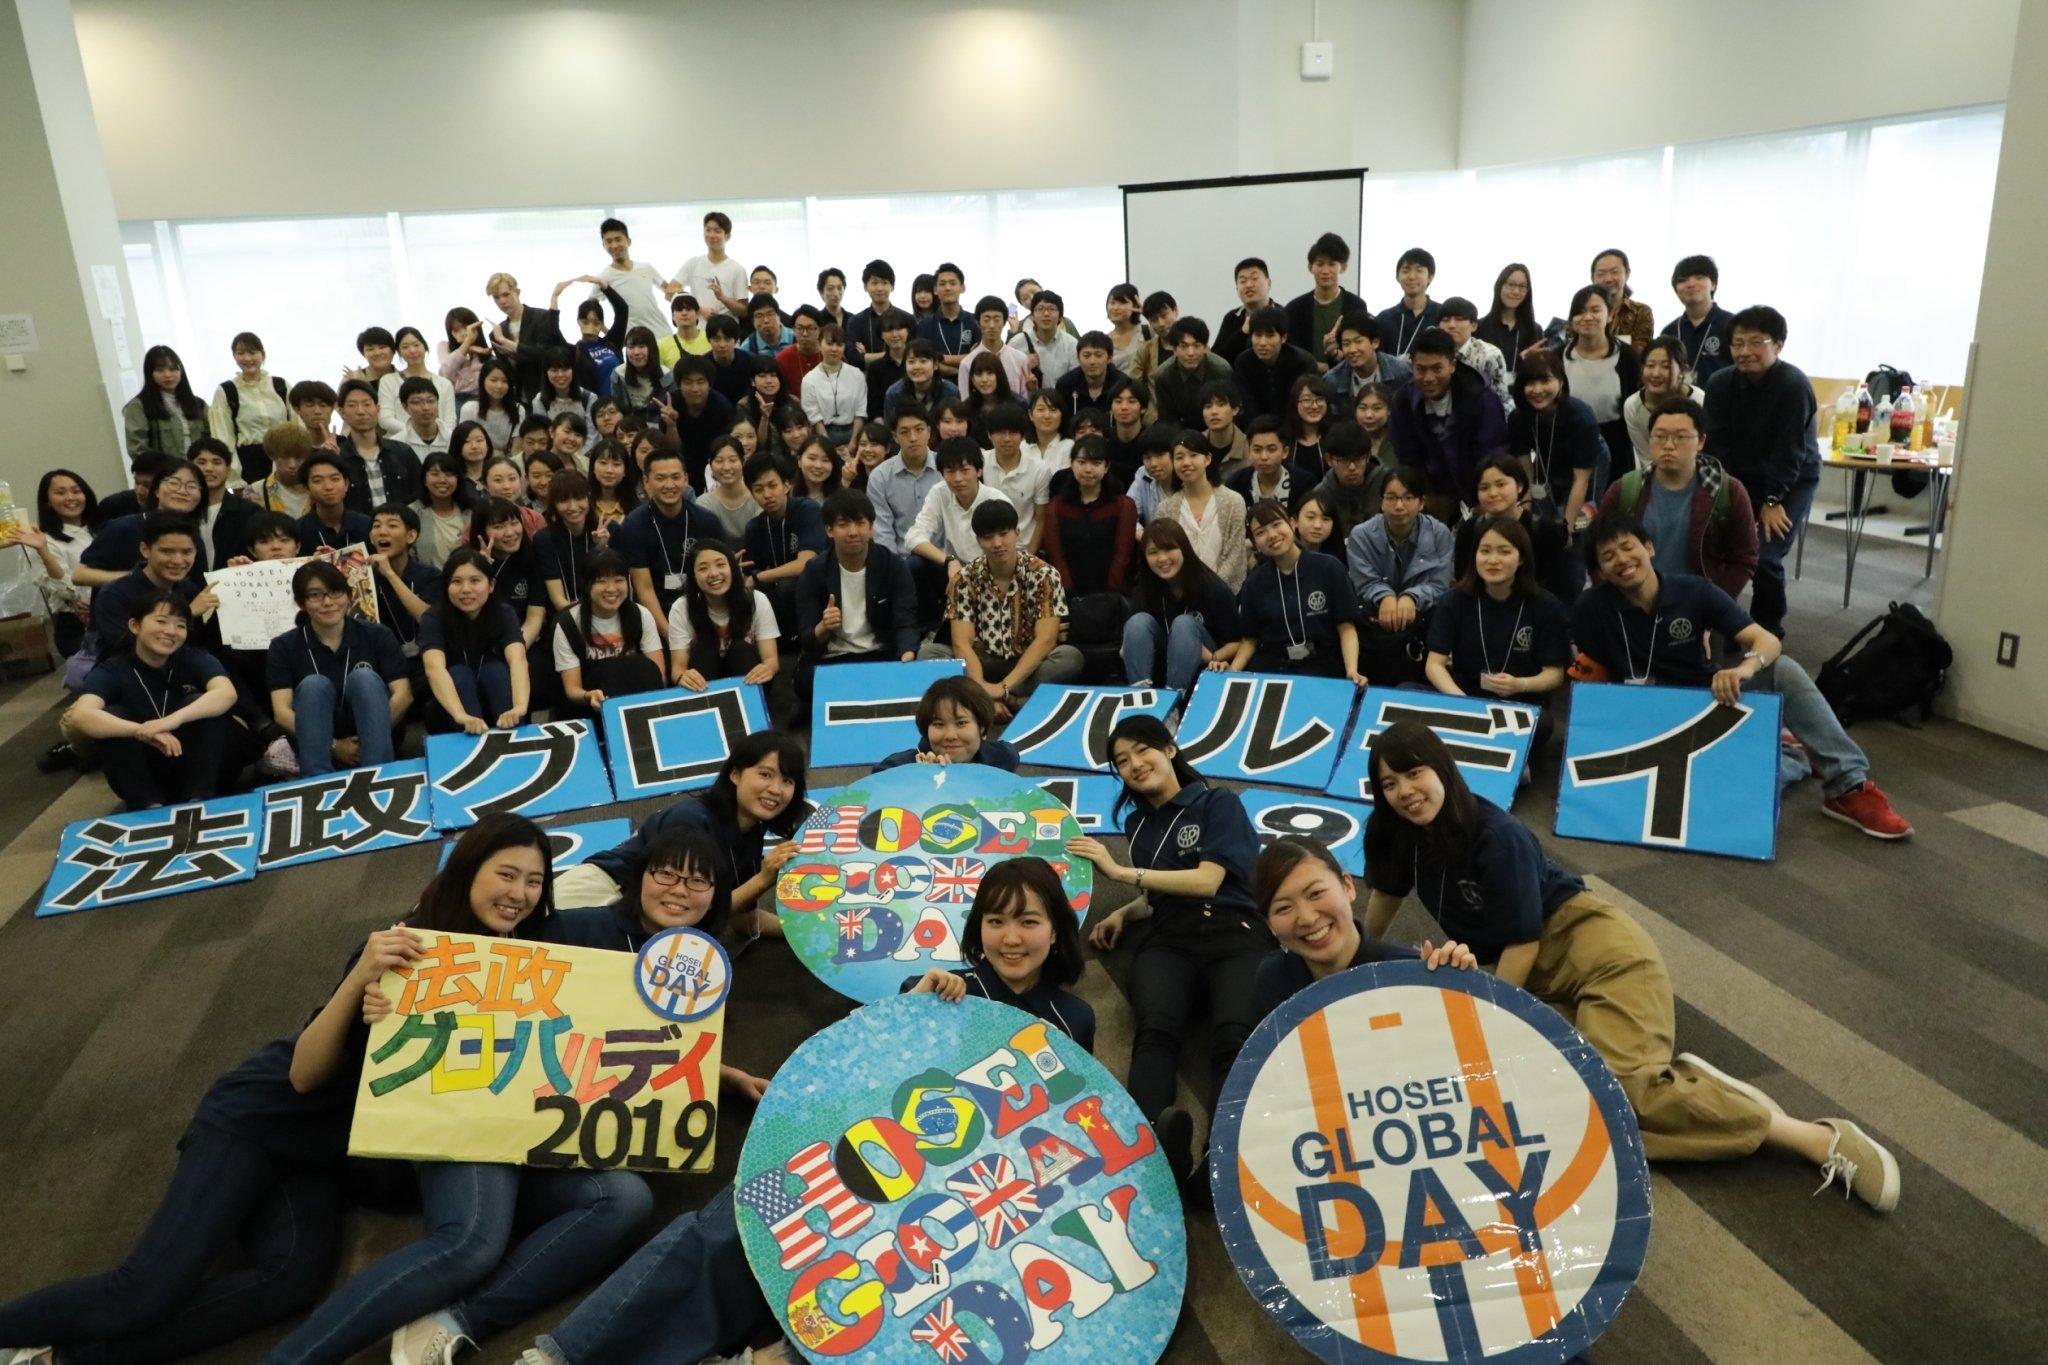 hosei-global-day-photo